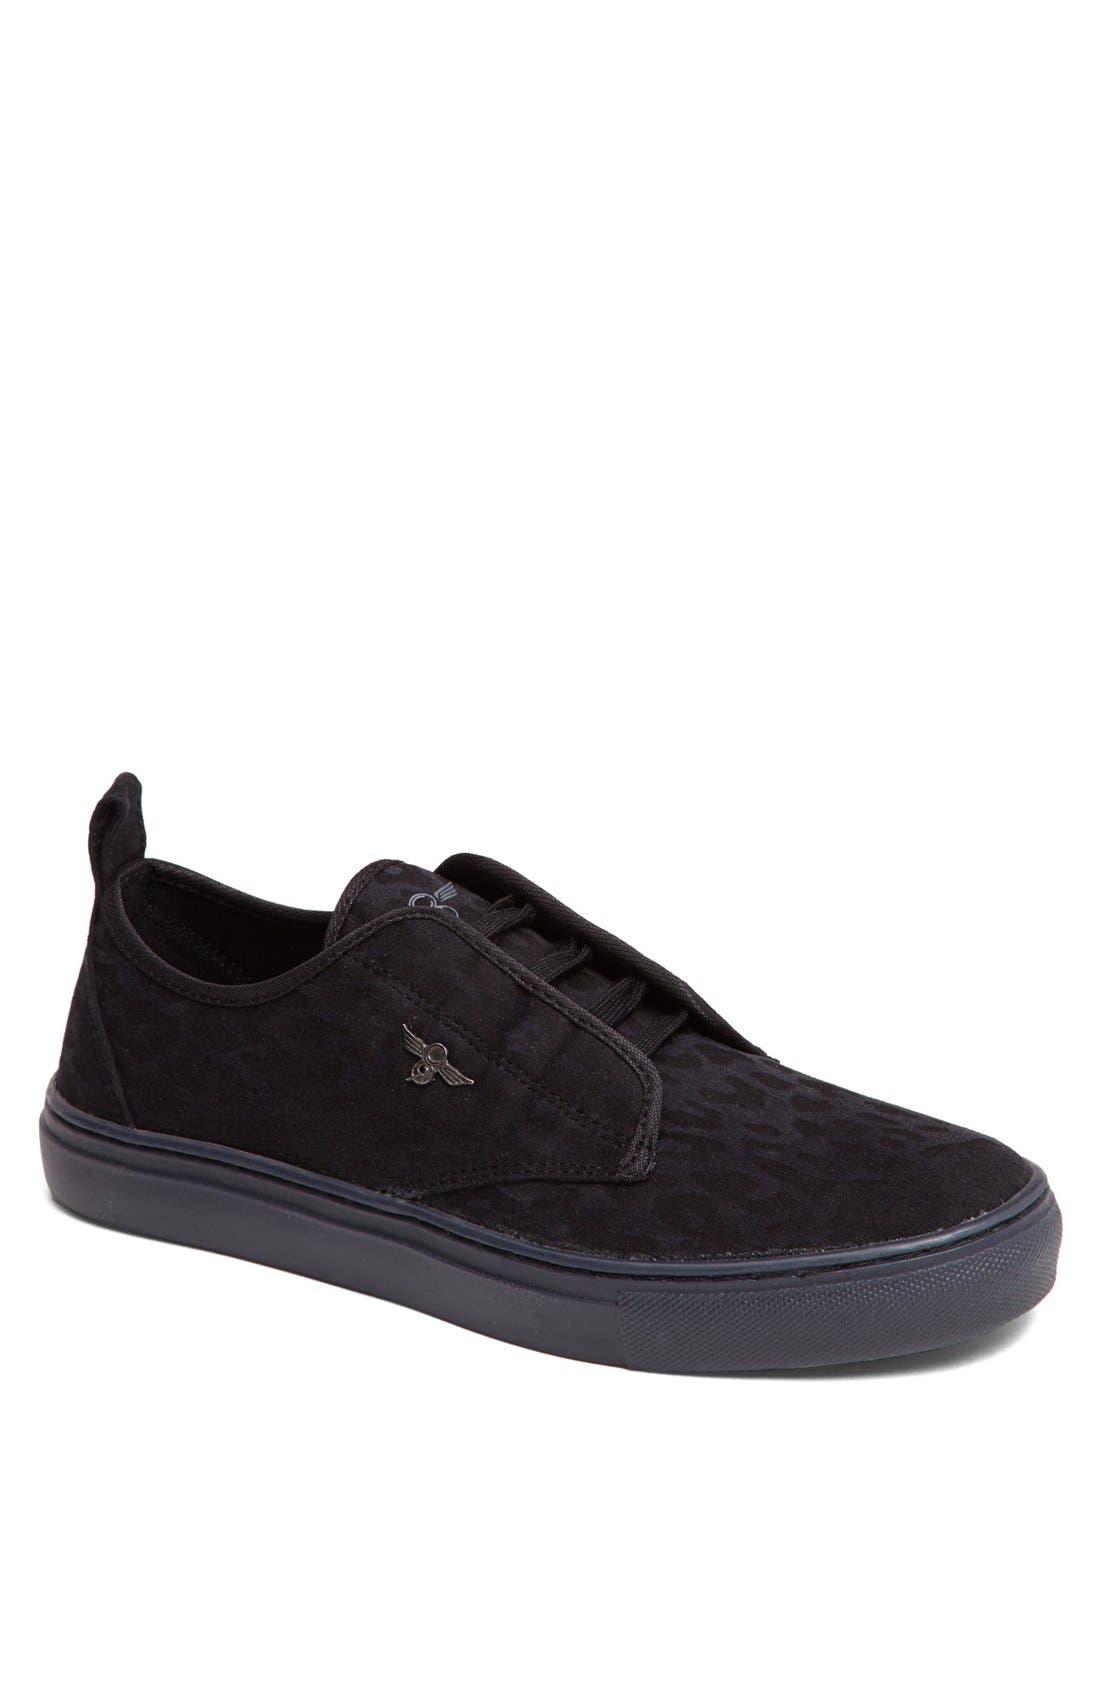 Alternate Image 1 Selected - Creative Recreation 'Lacava' Sneaker